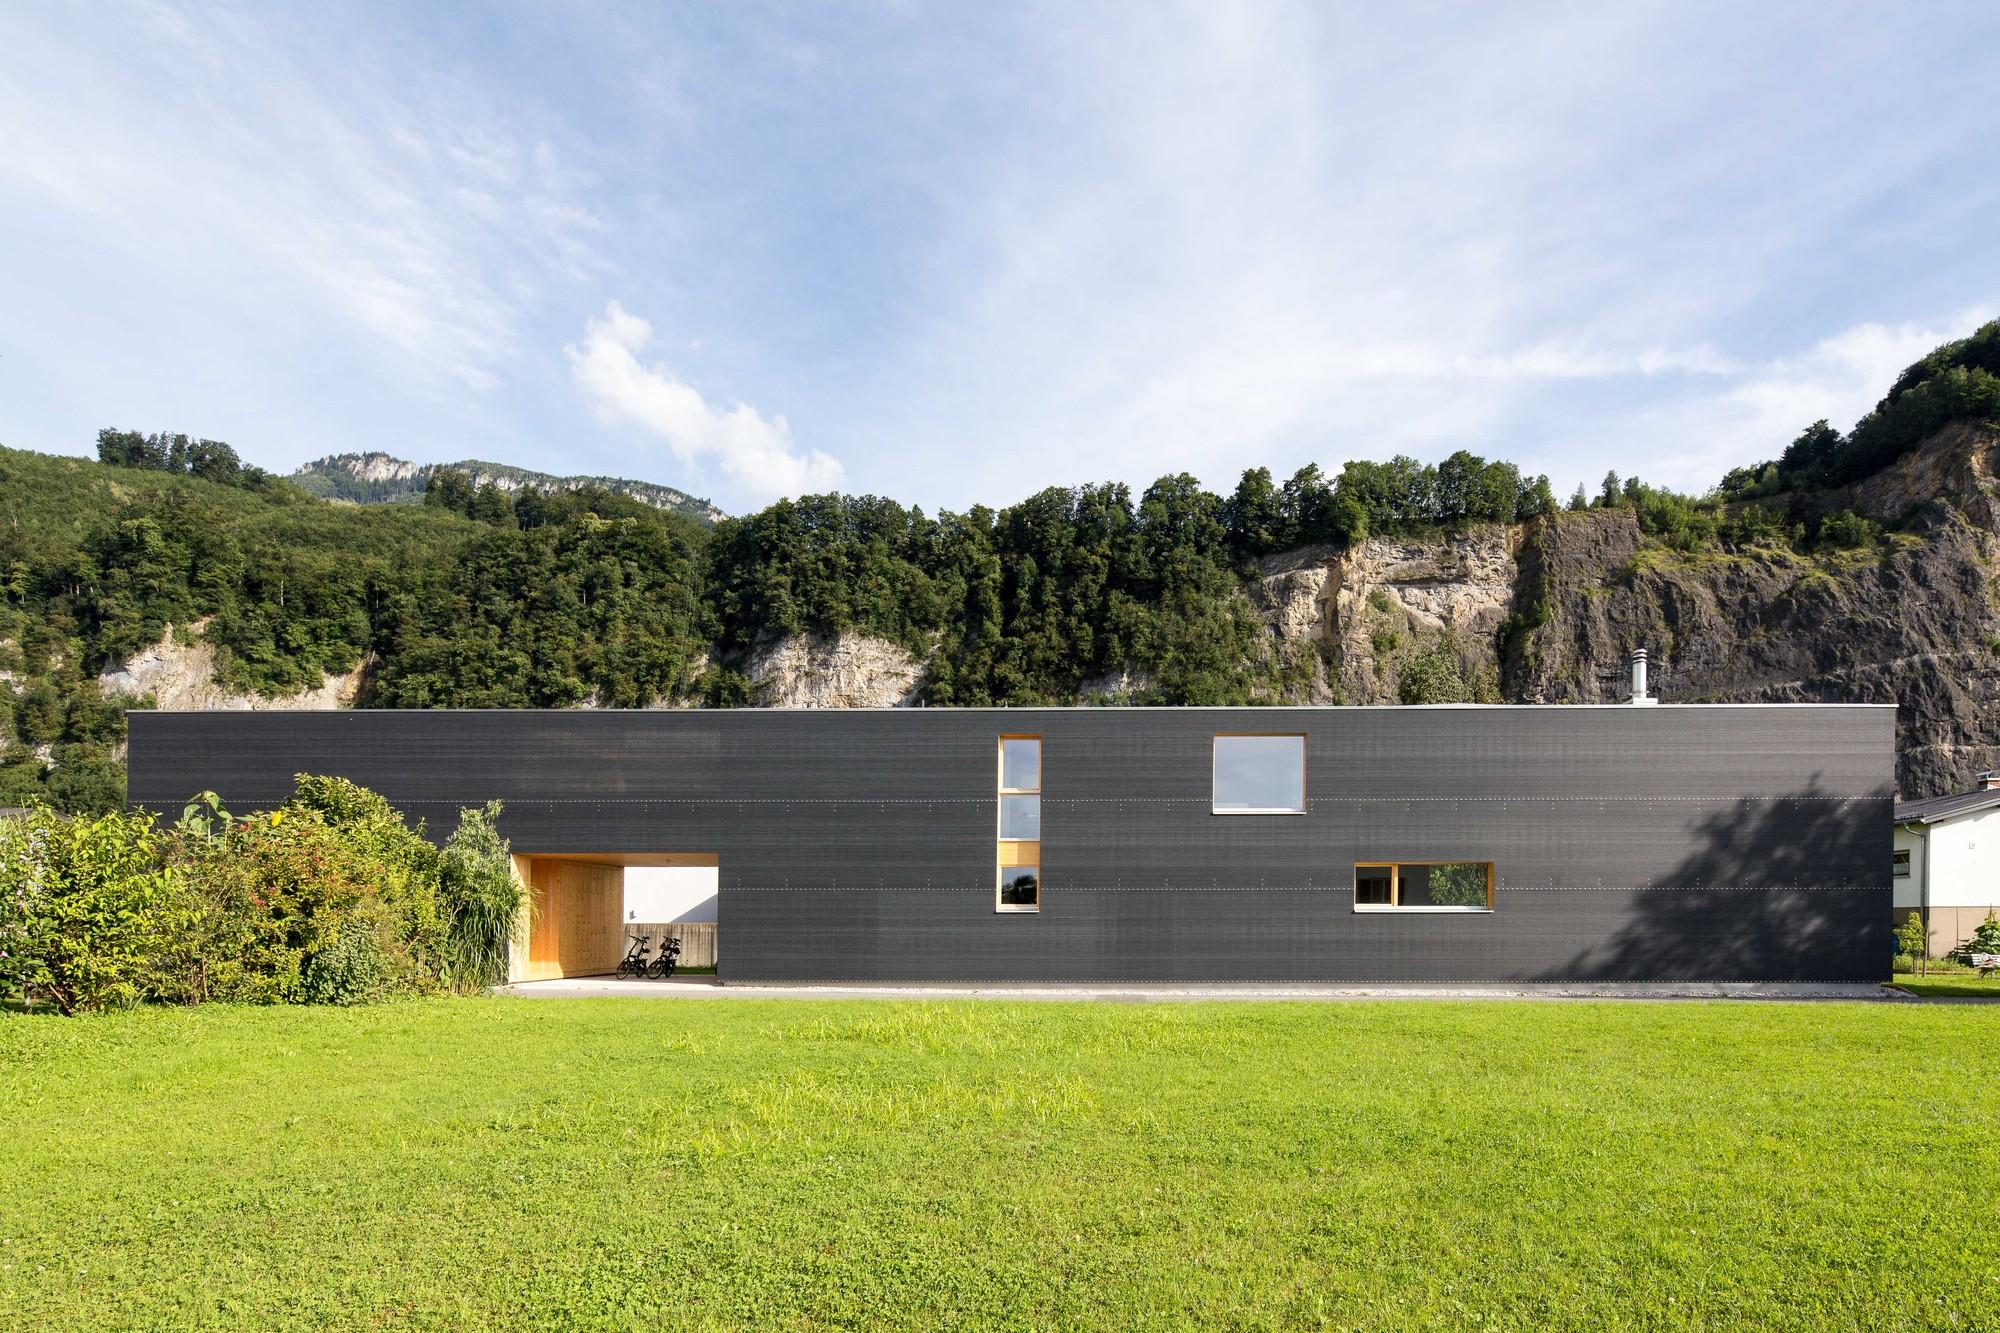 37m in Hohenems / Juri Troy Architects, Courtesy of Juri Troy